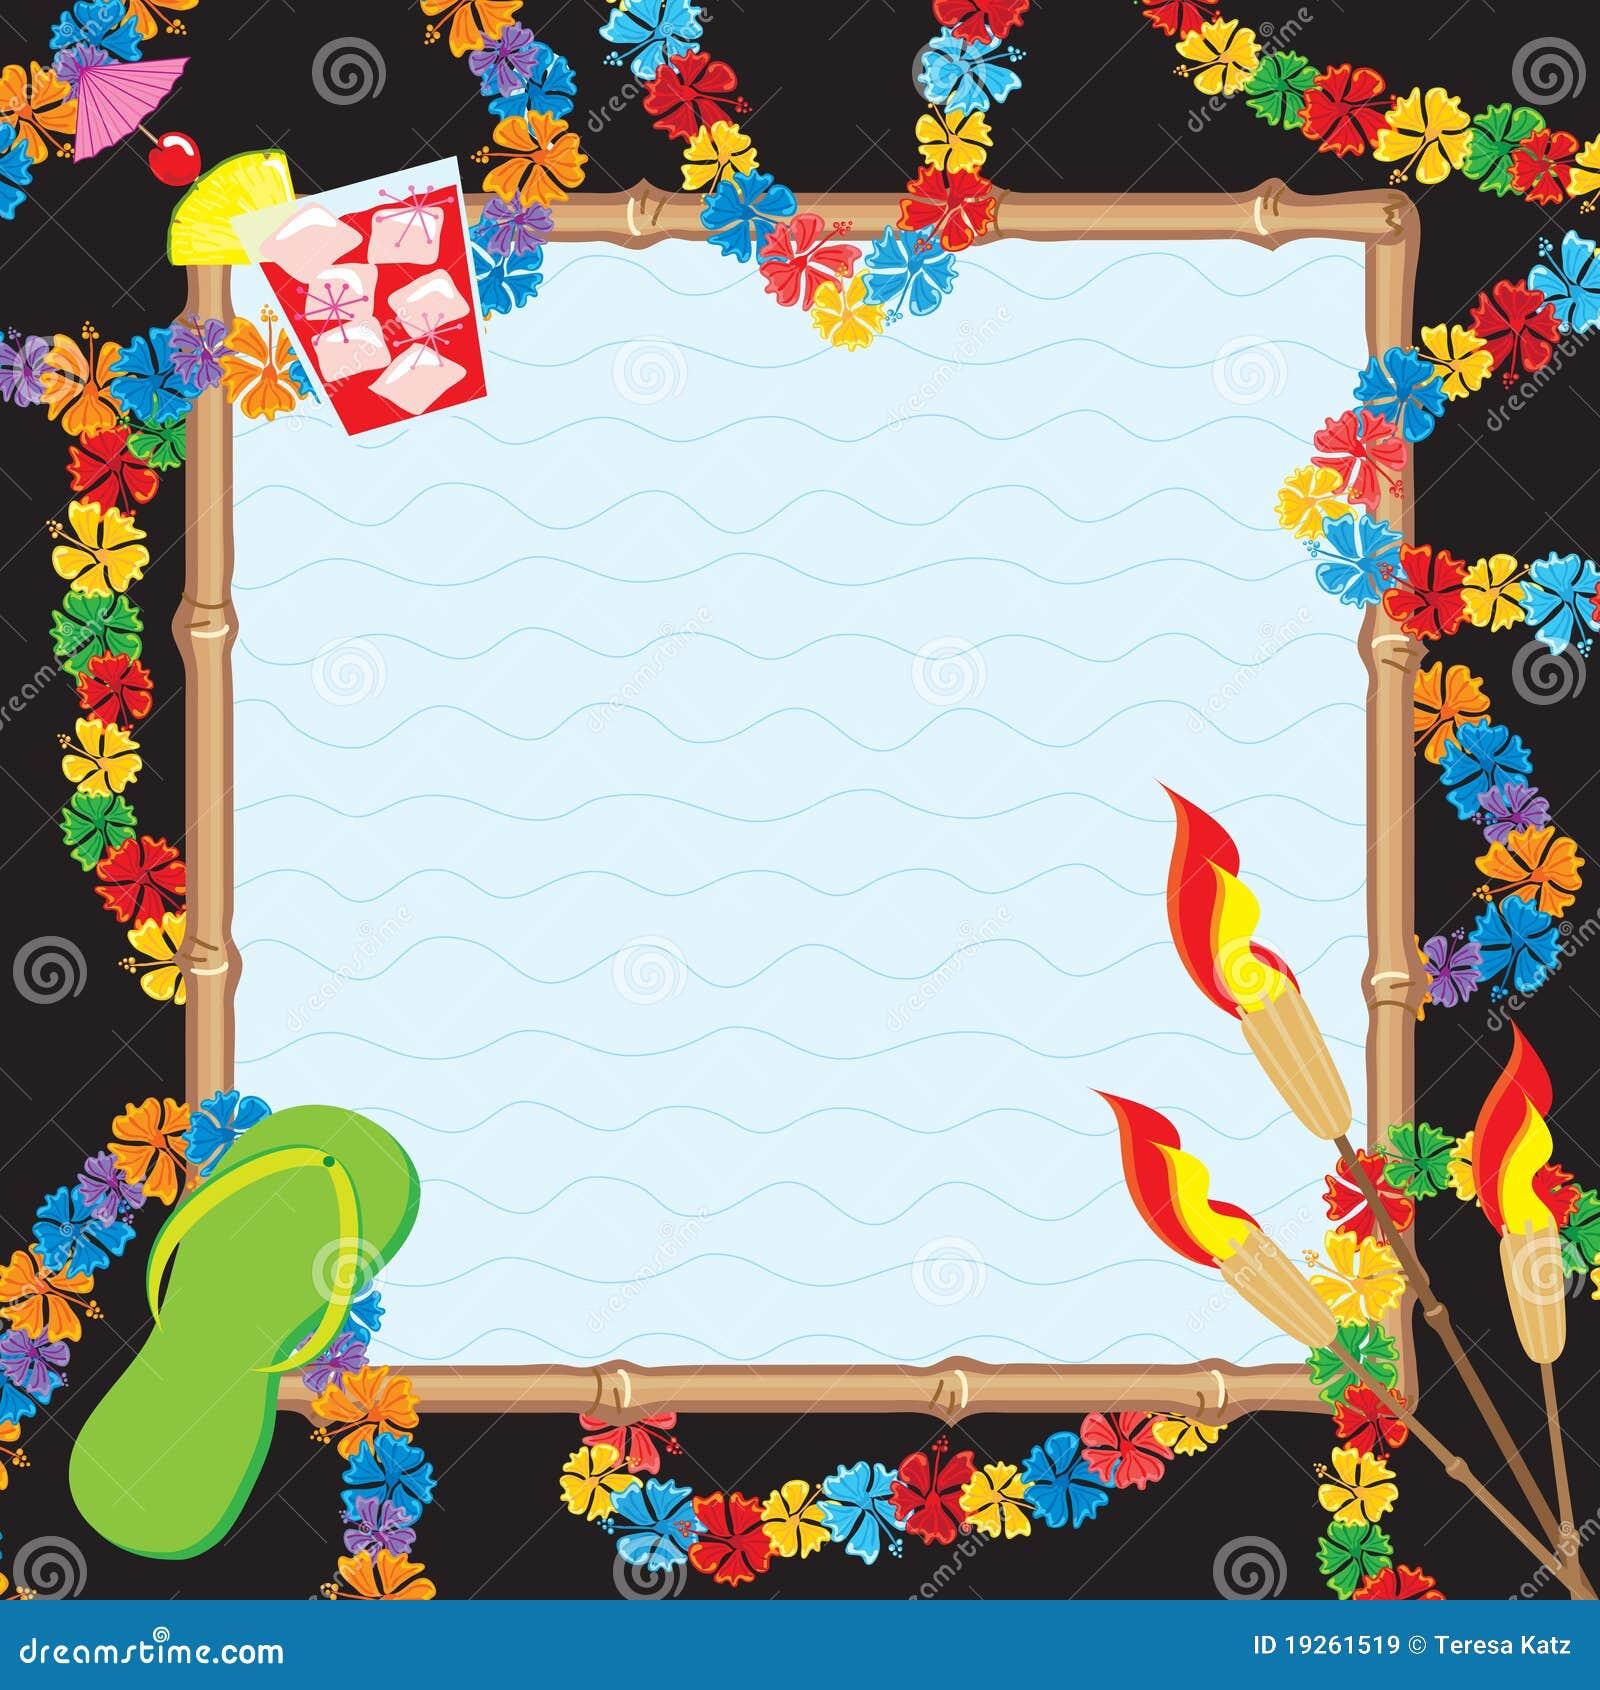 Hawaiian Pool Party Invitation Stock Vector - Illustration of ...